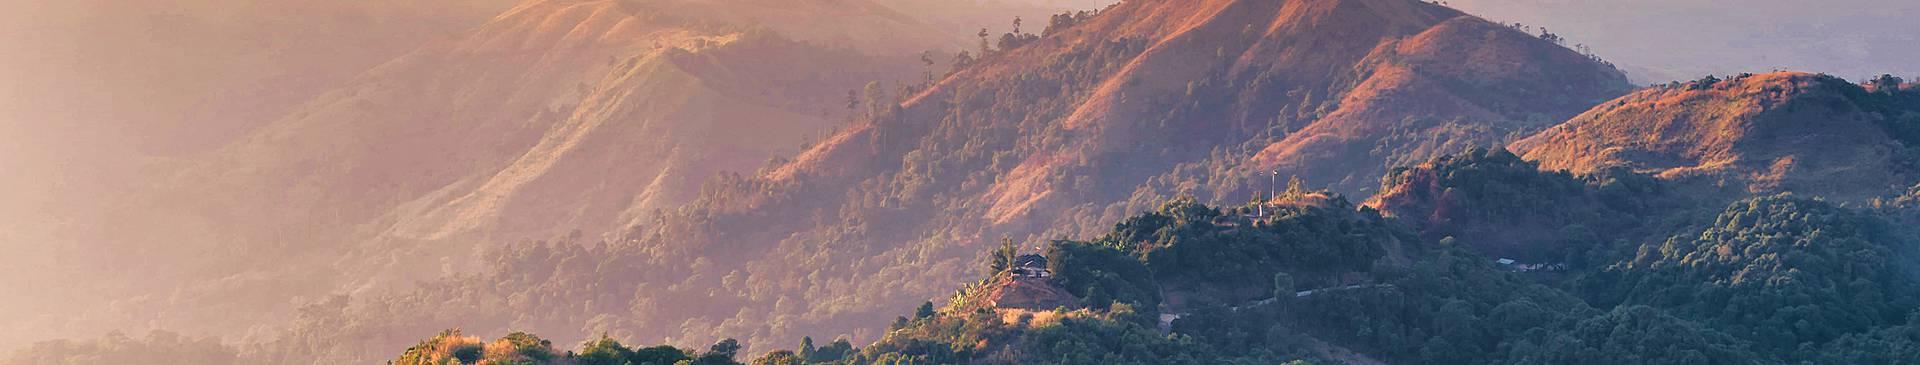 Rainforest tours in Burma